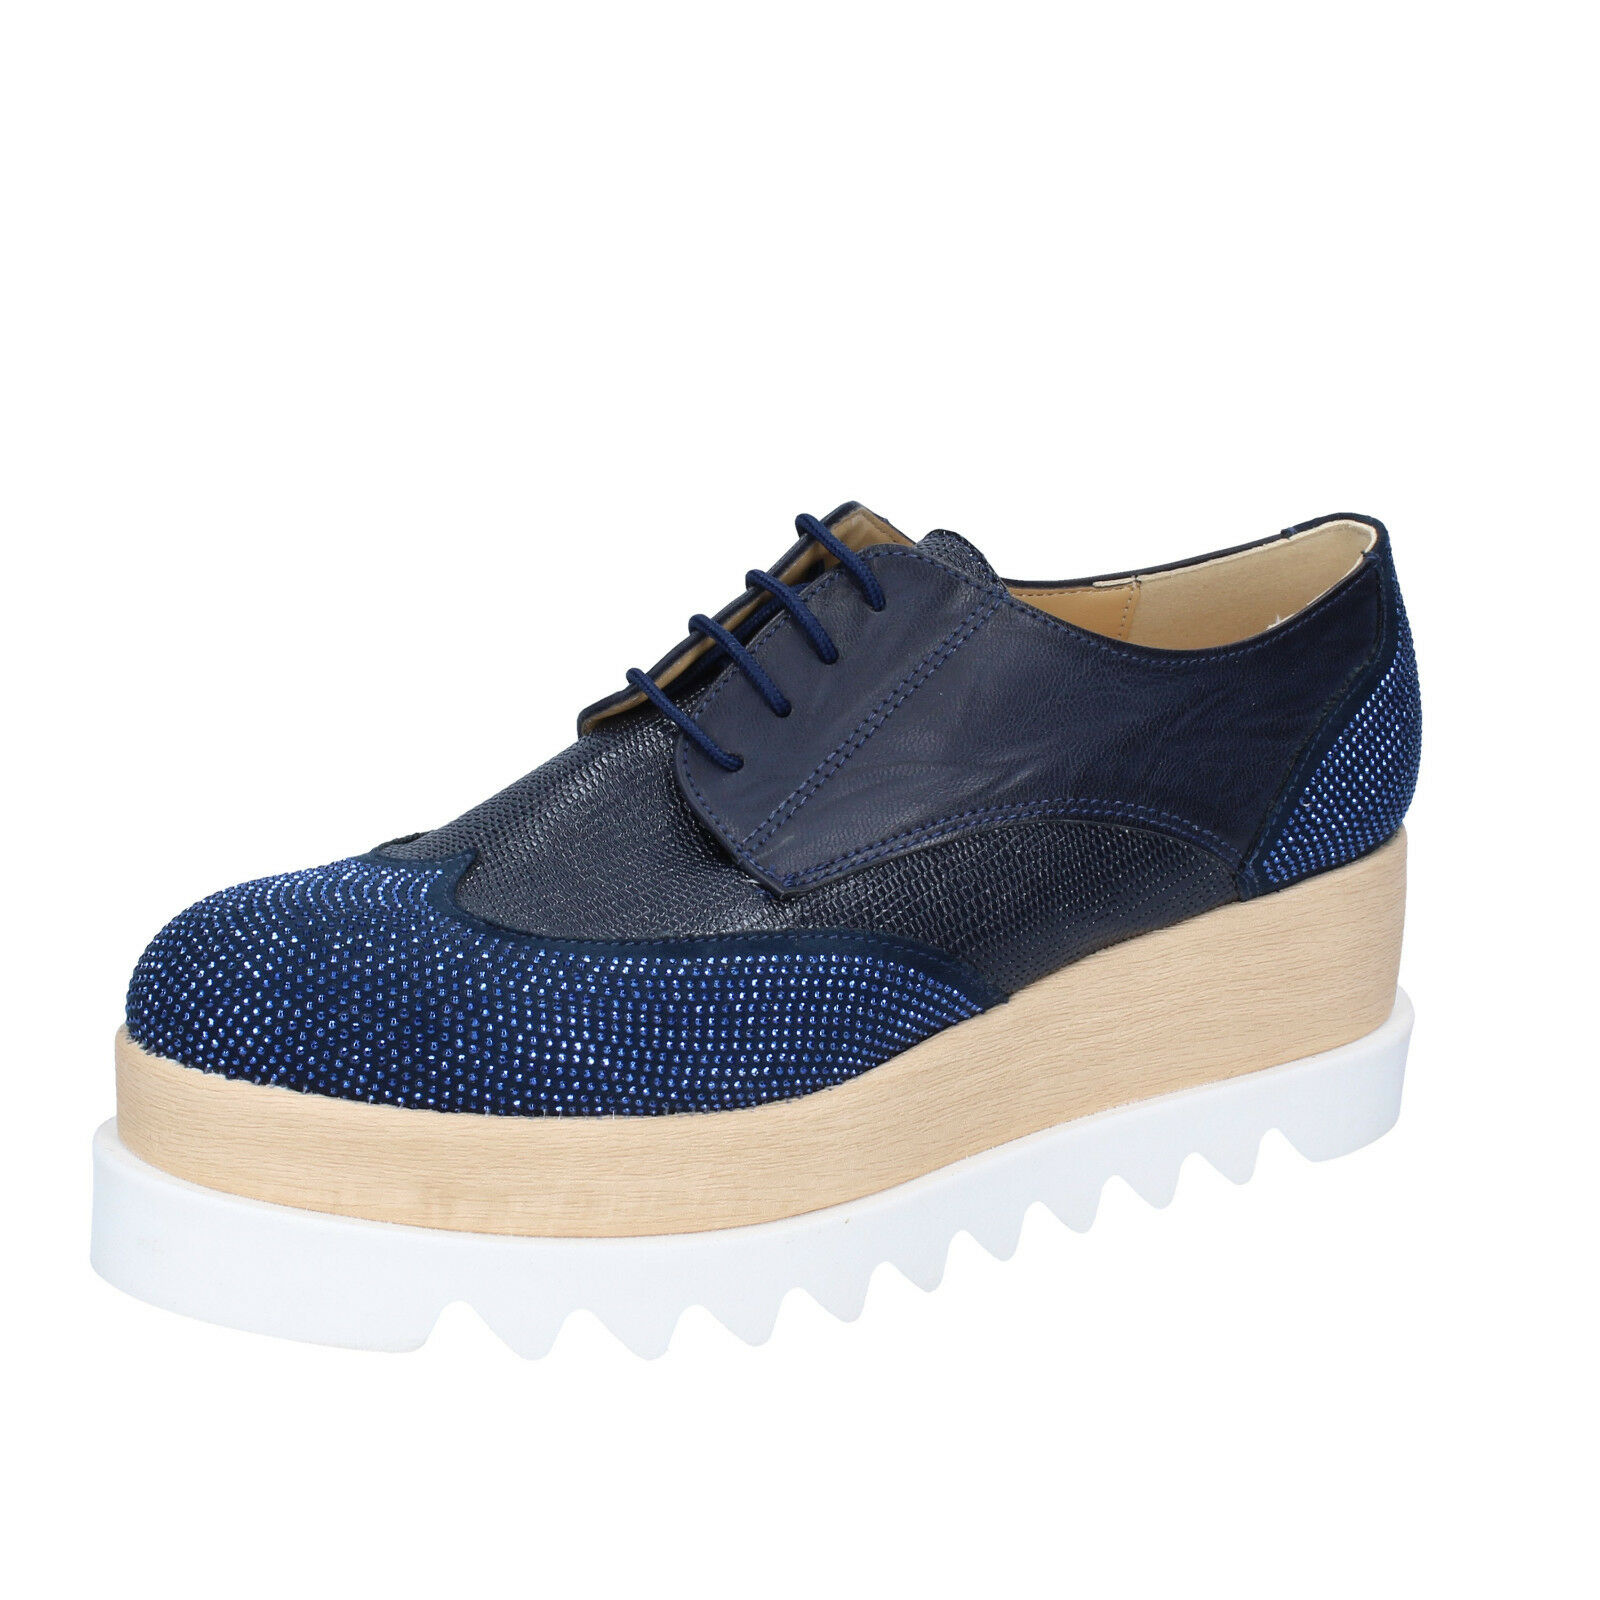 Para mujeres Zapatos Olga Rubini 5 (EU 38) 38) 38) Elegante Azul Cuero Gamuza Strass BS96-38  envío gratis